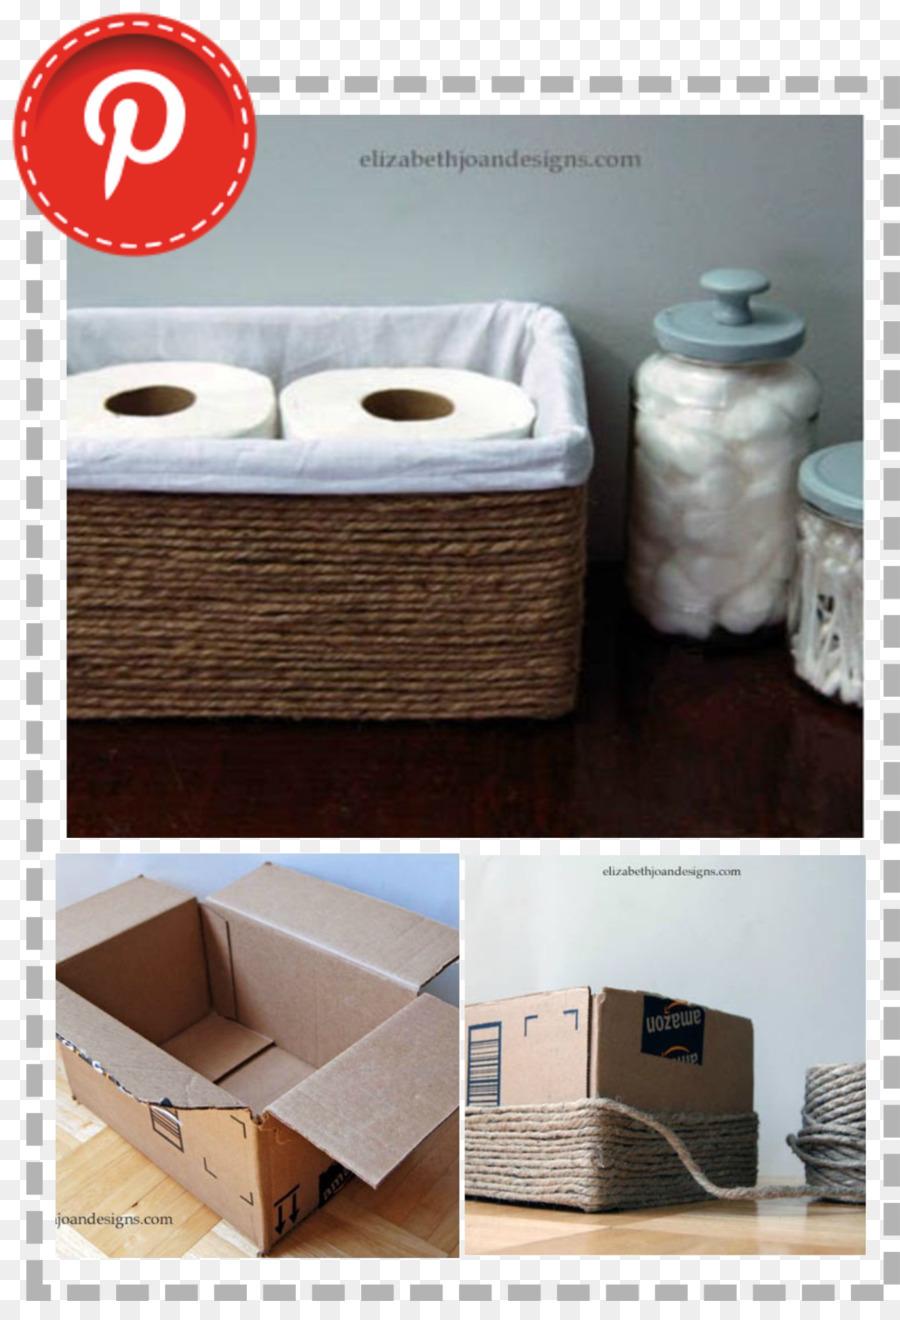 Basket cardboard box do it yourself bathroom diy album png basket cardboard box do it yourself bathroom diy album solutioingenieria Image collections